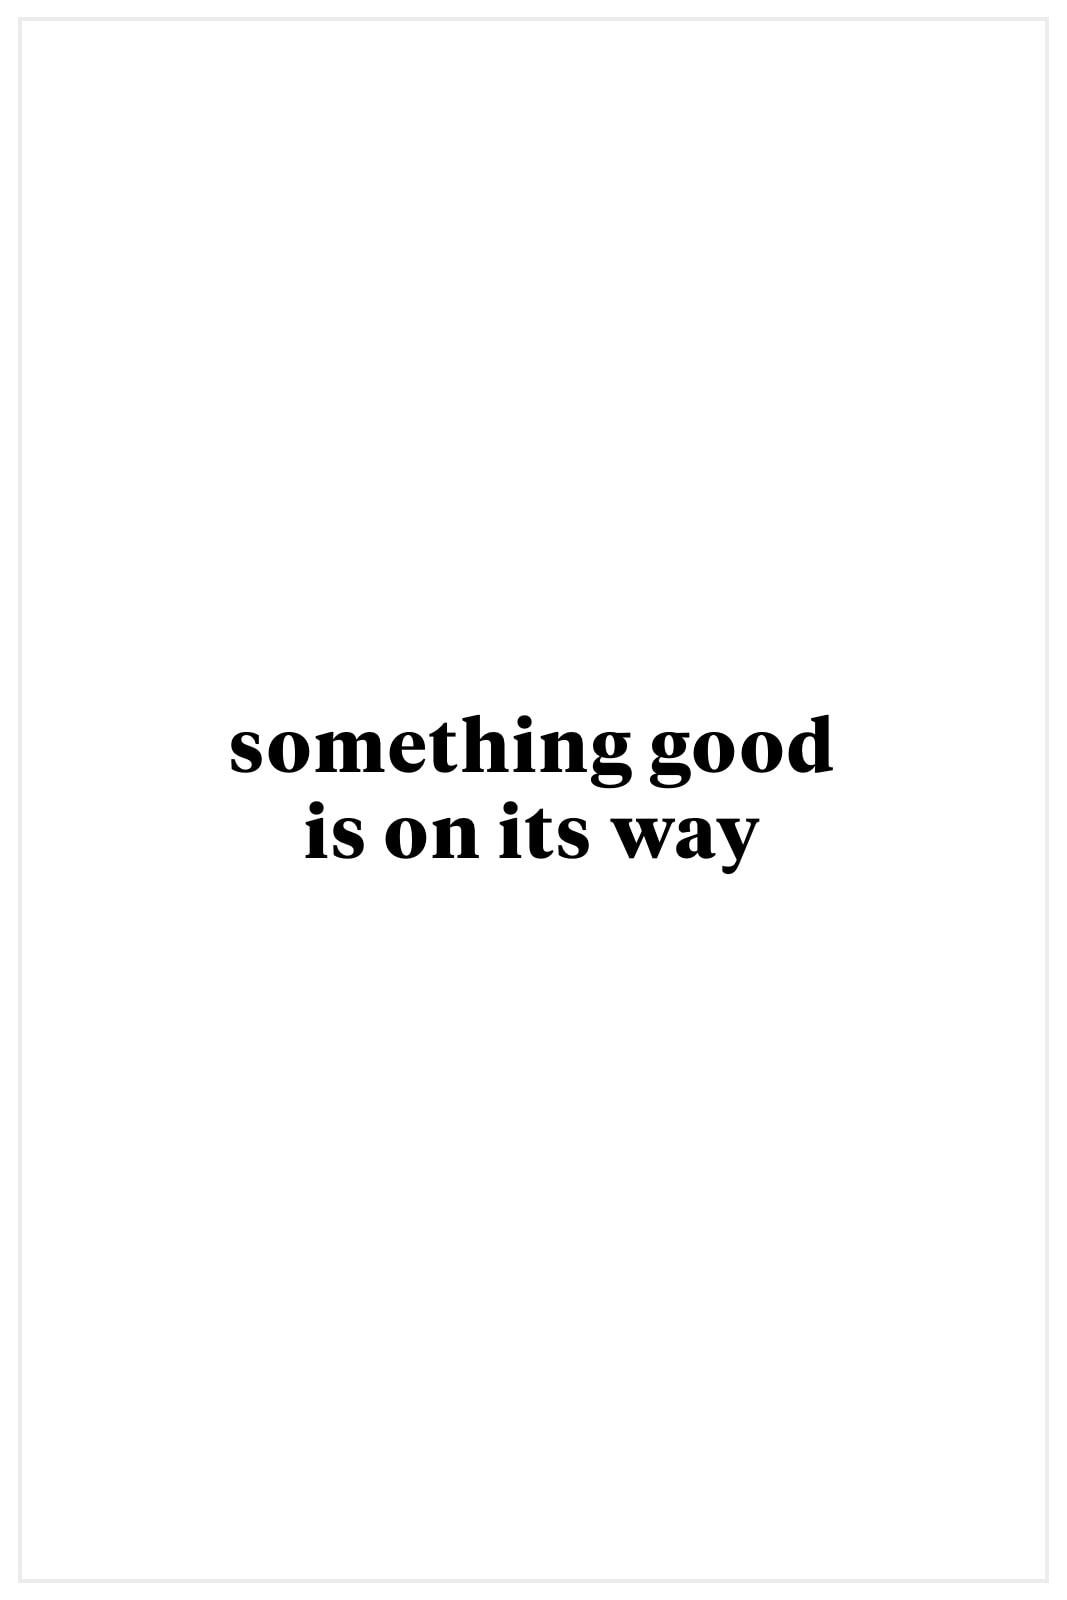 Izzie Boot